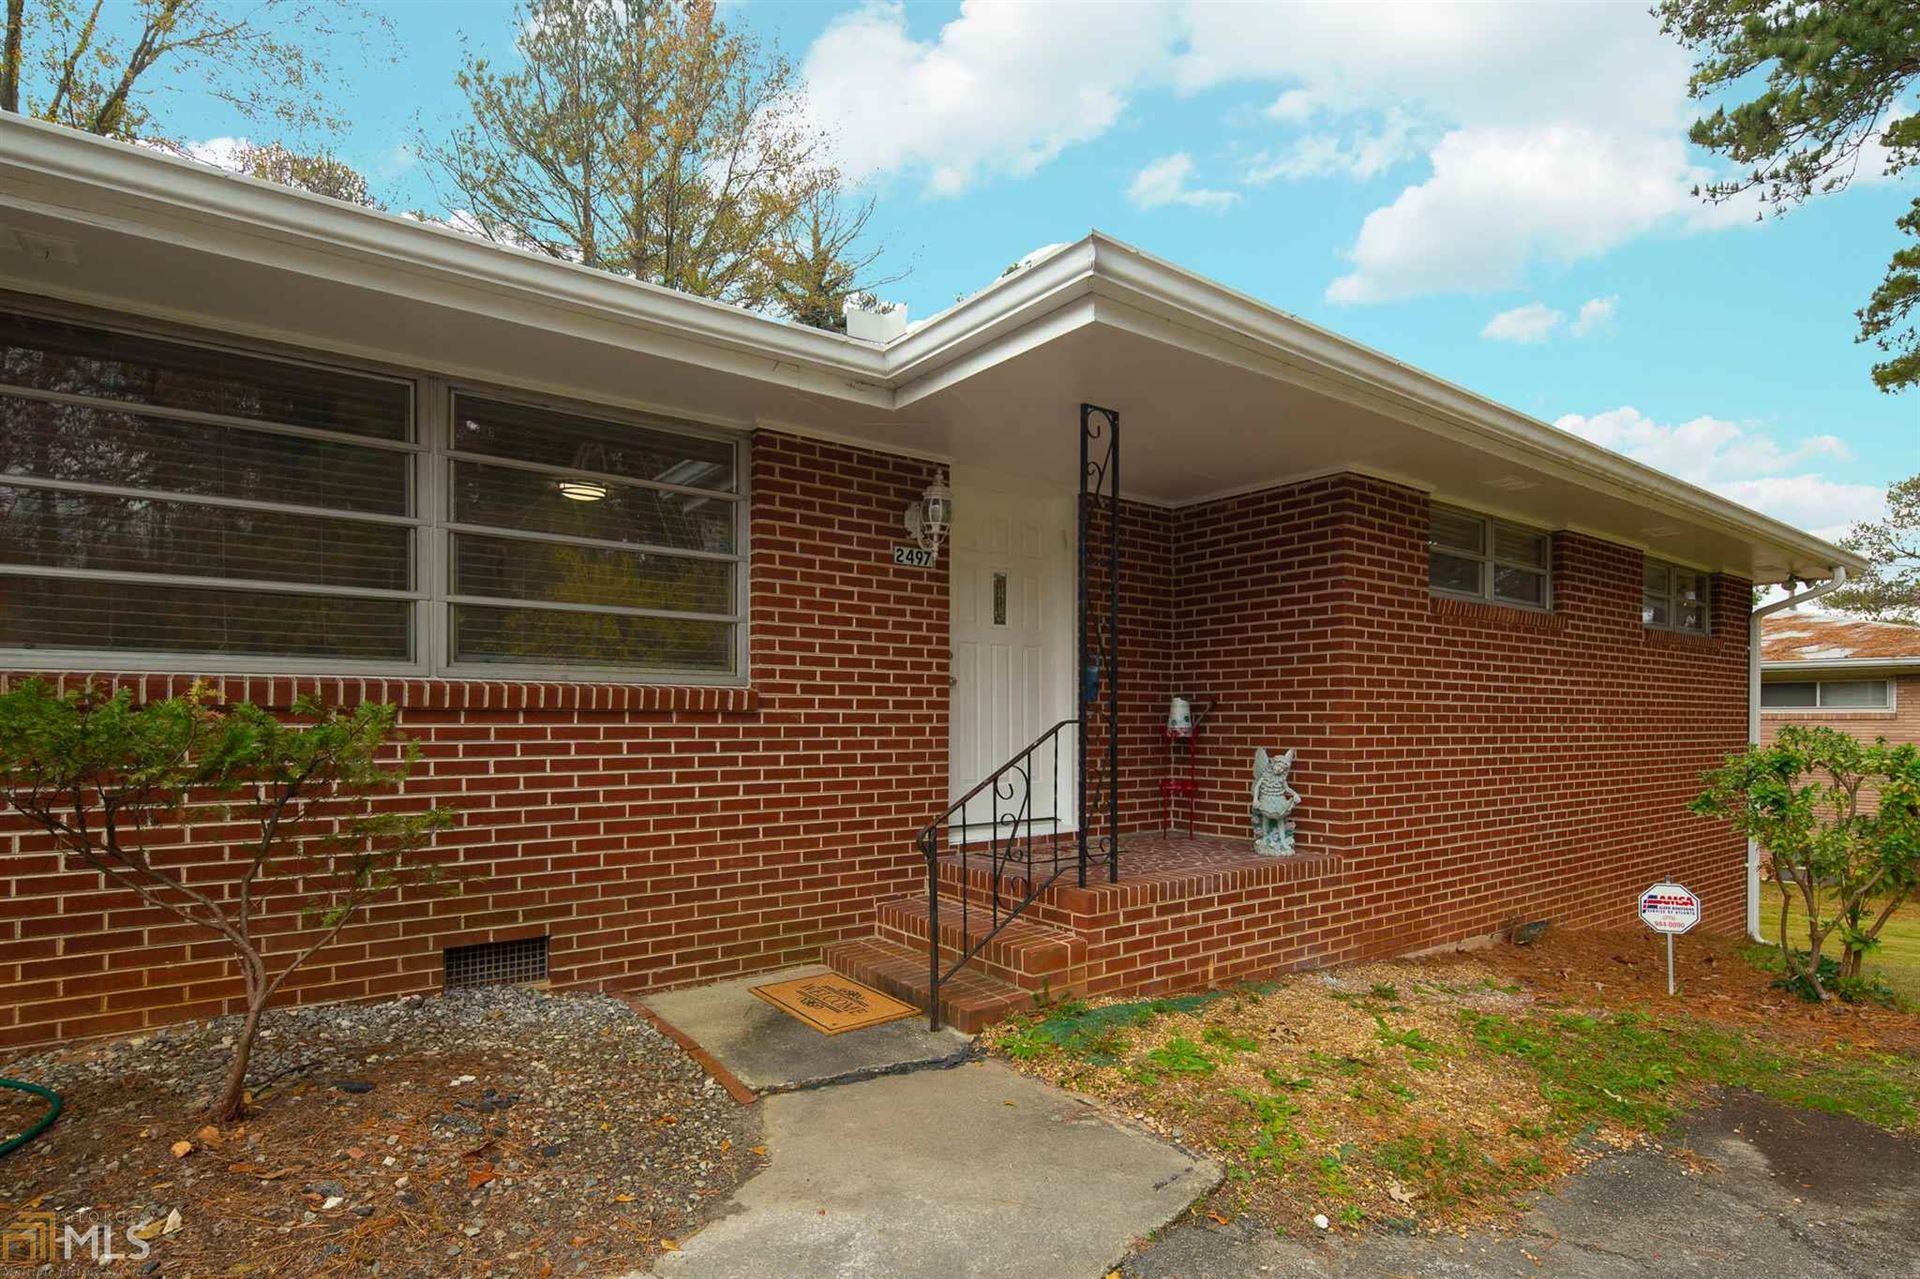 2497 N Druid Hills Rd, Atlanta, GA 30329 - MLS#: 8901958